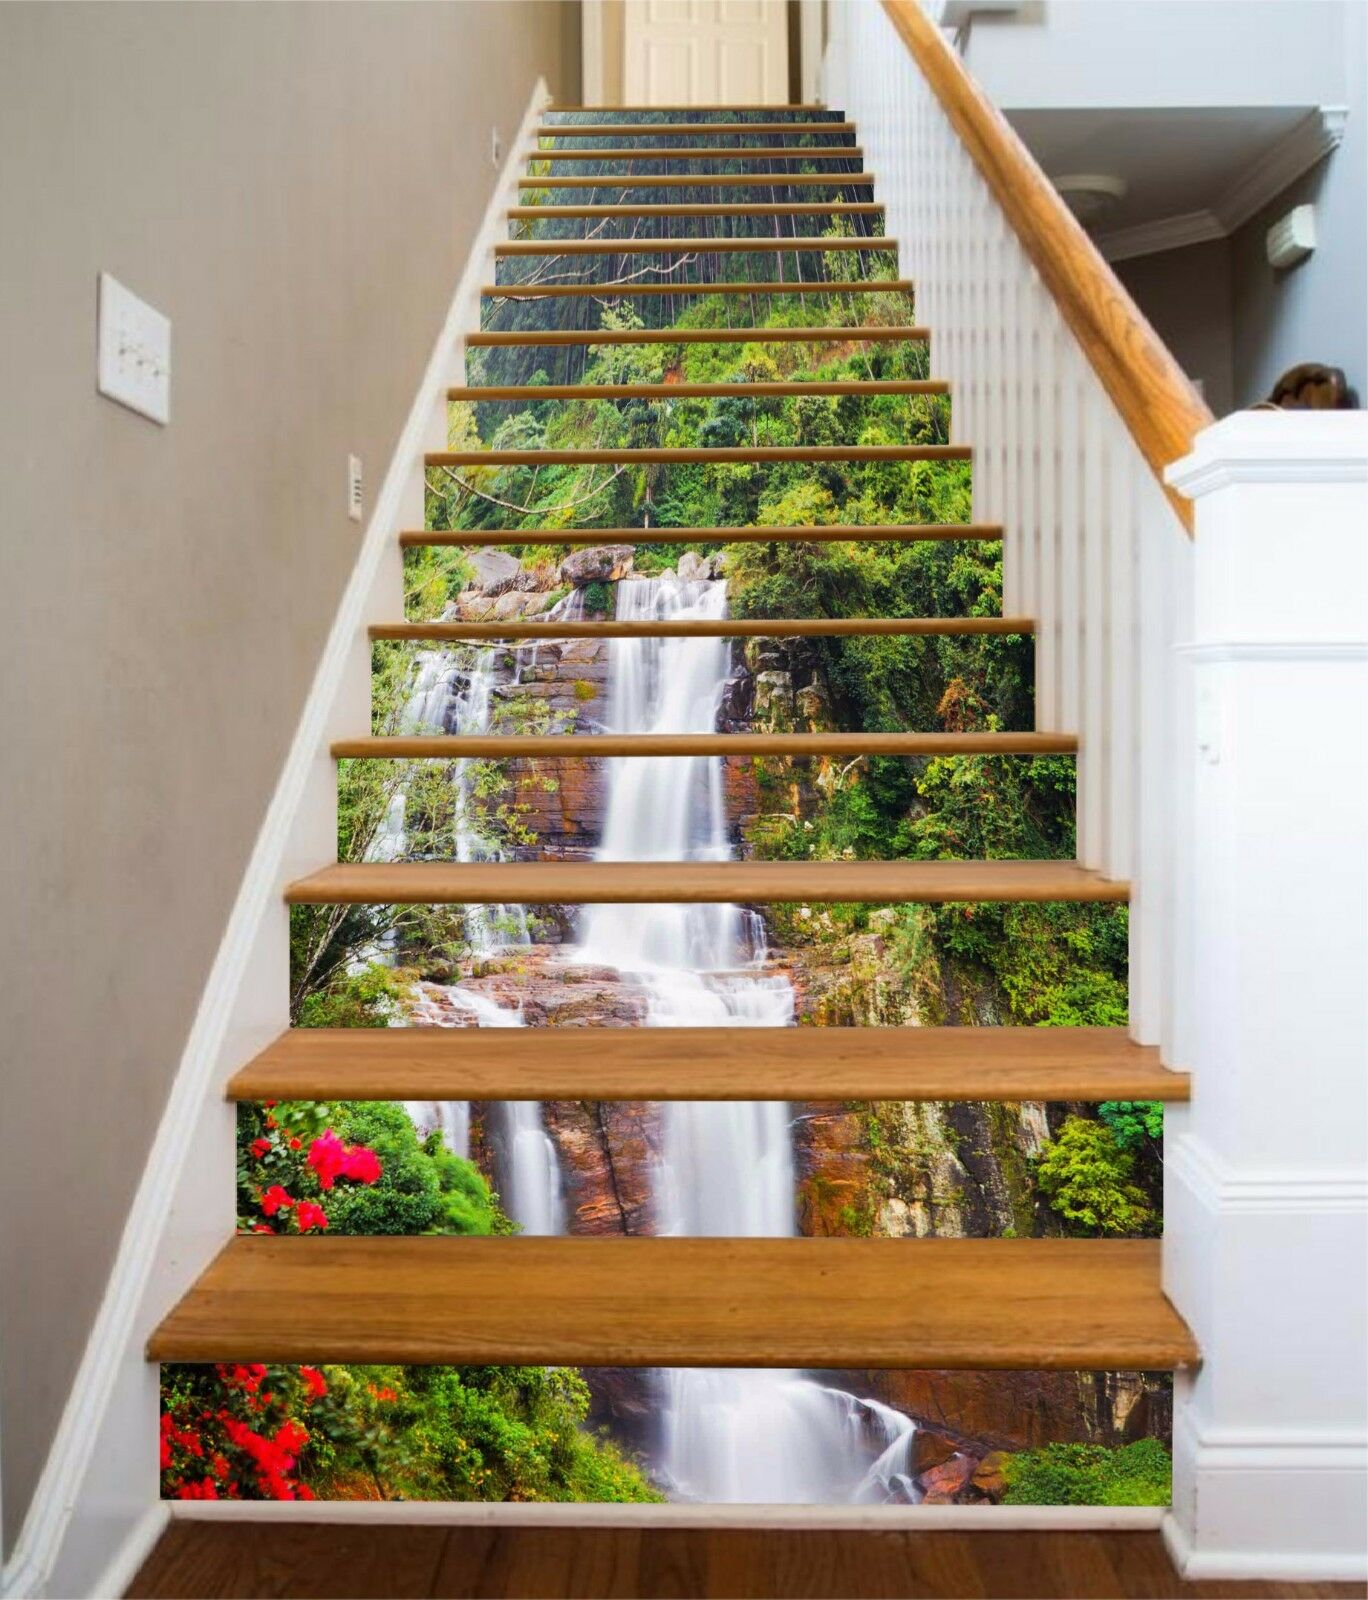 3D Steep Creek 791 Stair Risers Decoration Photo Mural Vinyl Decal Wallpaper AU